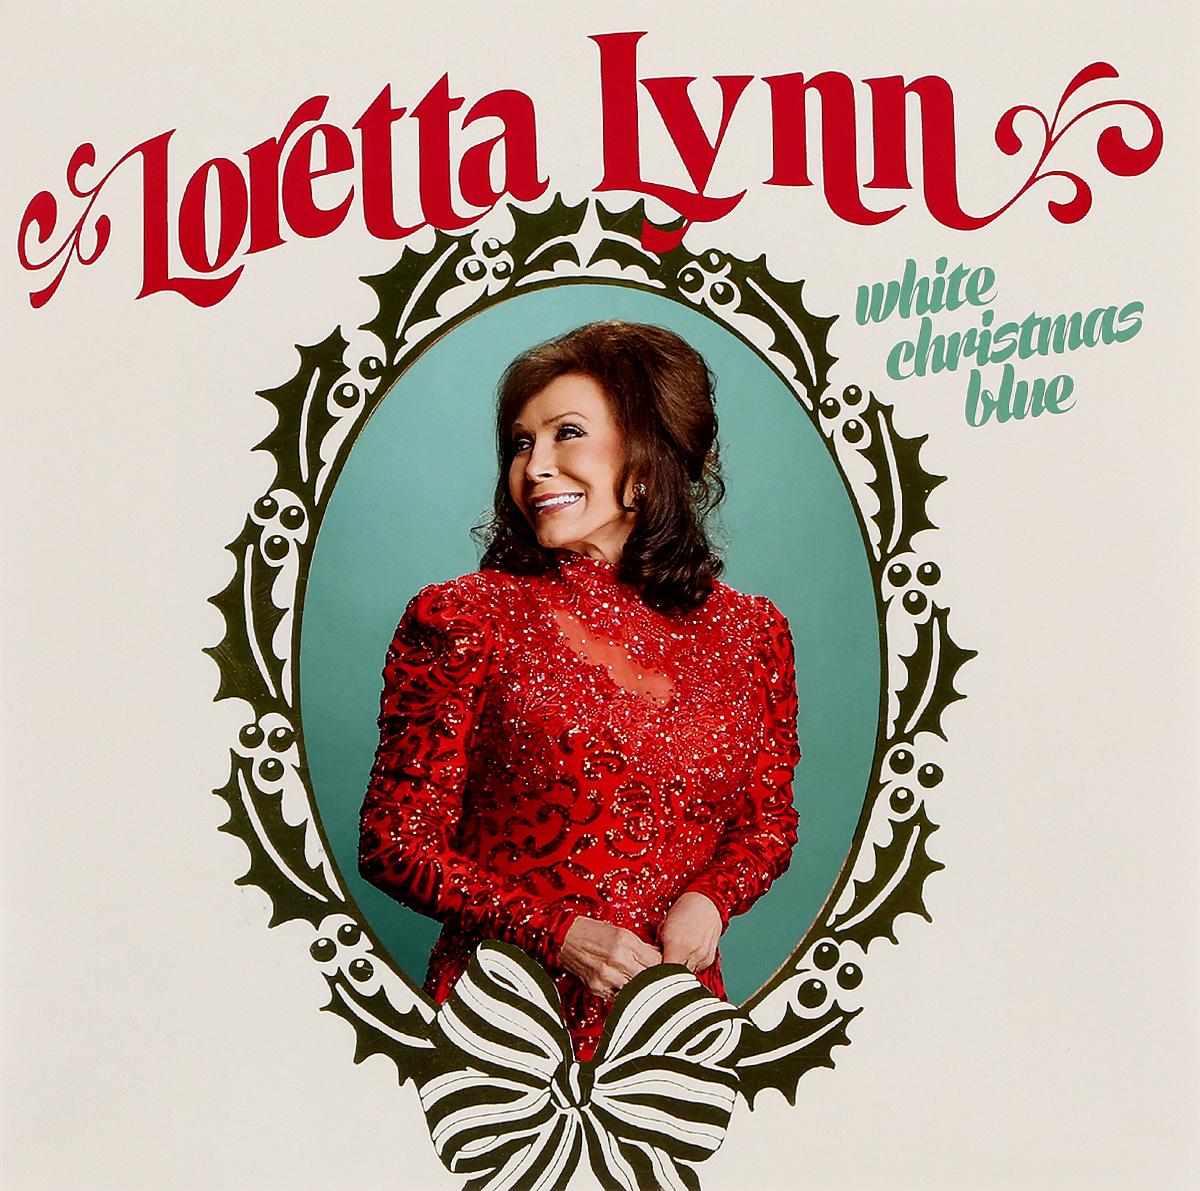 Лоретта Линн Loretta Lynn. White Christmas Blue (LP)